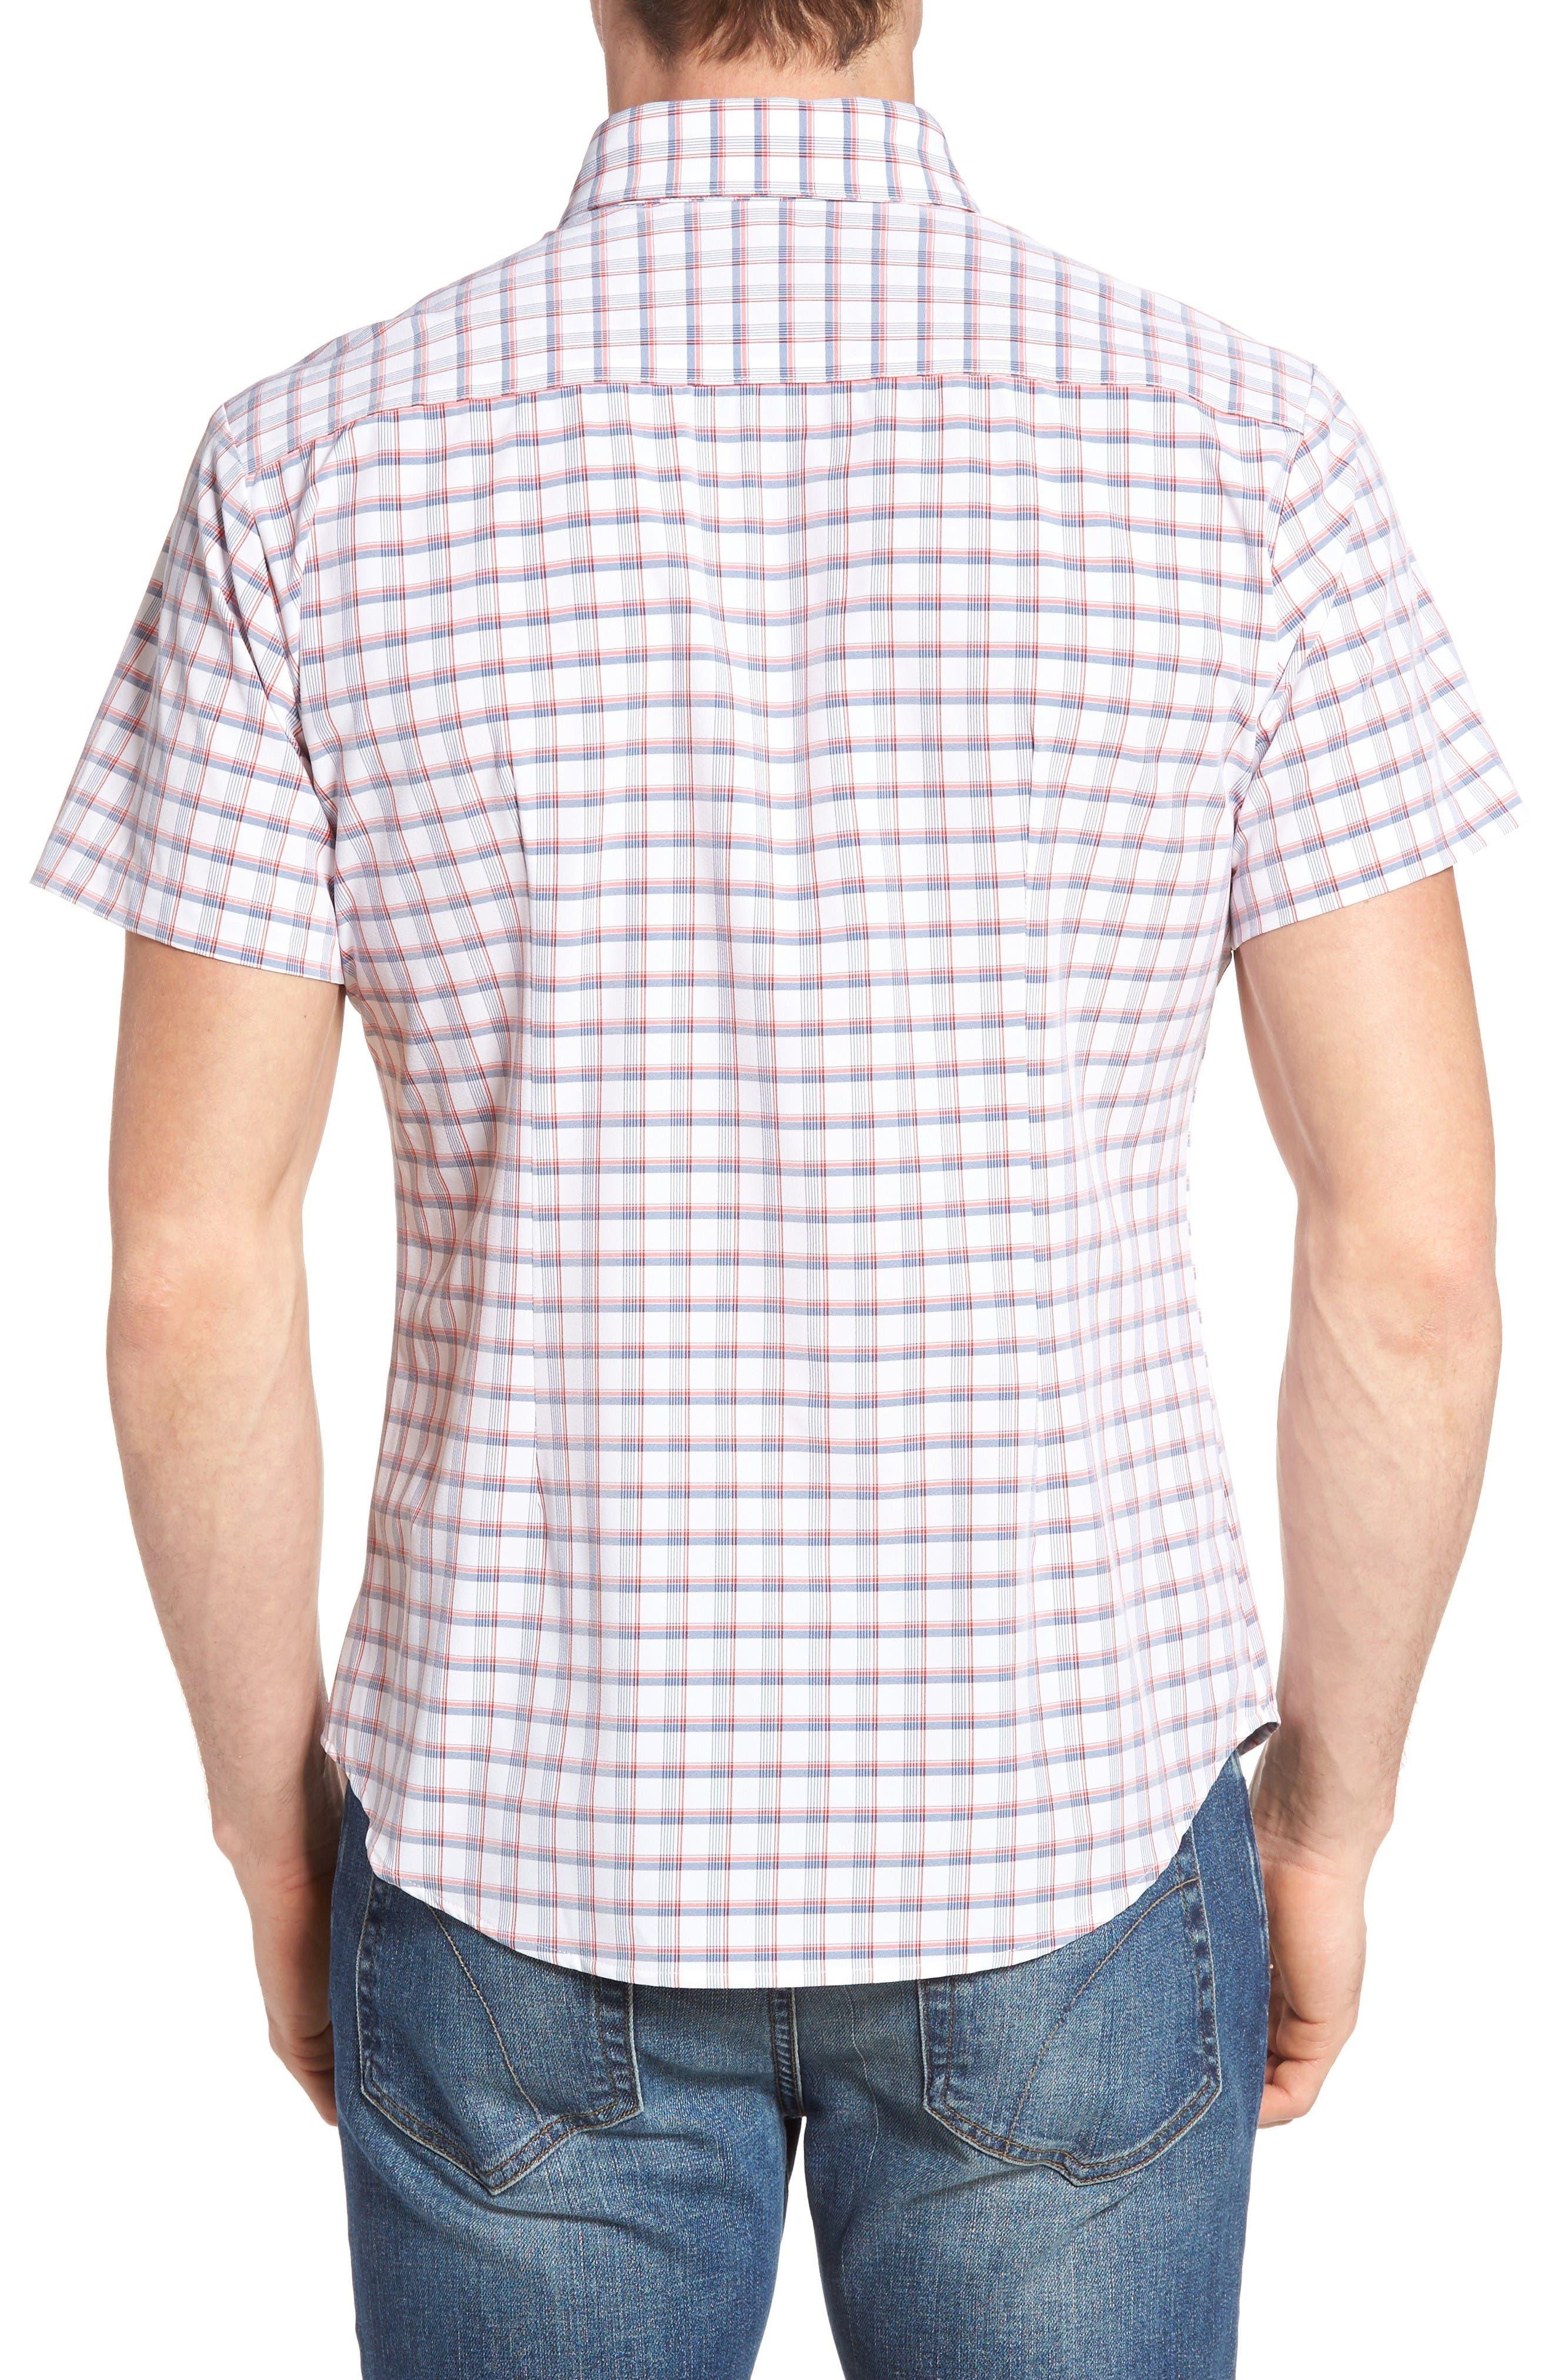 Alternate Image 2  - Mizzen+Main Sanford Slim Fit Plaid Performance Sport Shirt